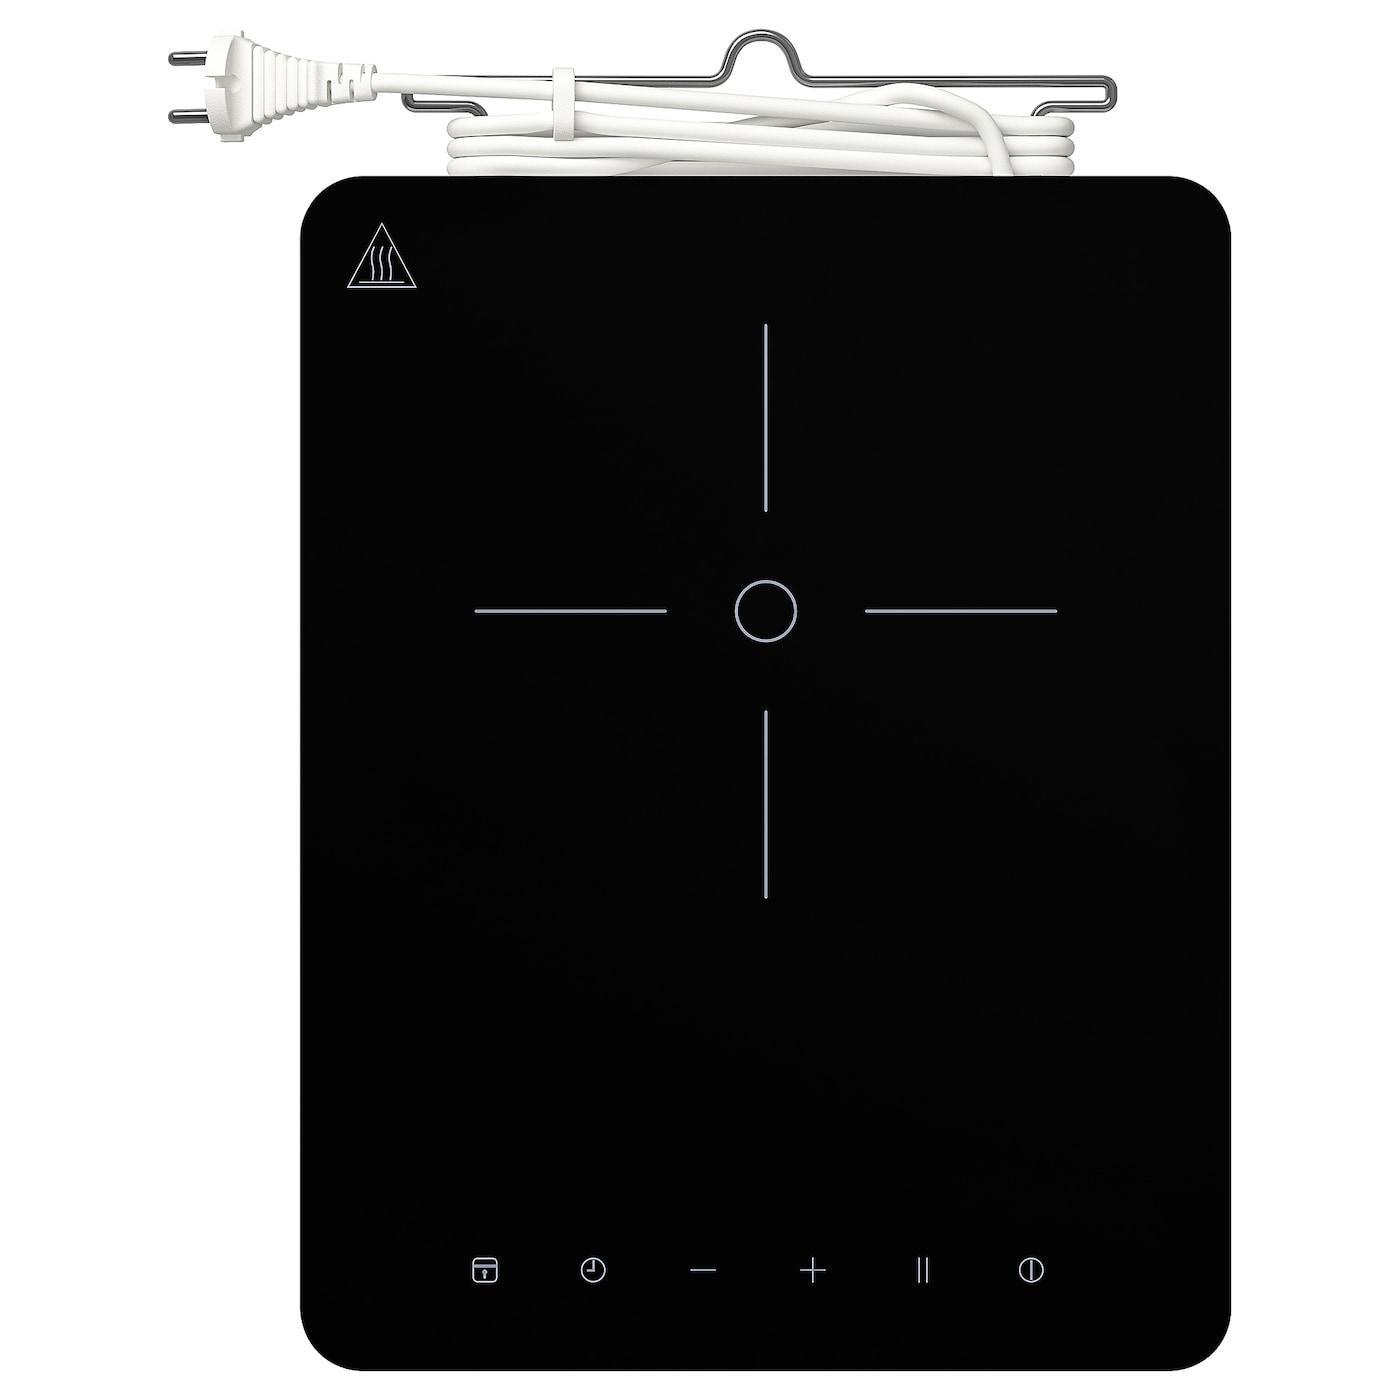 Tillreda Portable Induction Hob White Ikea